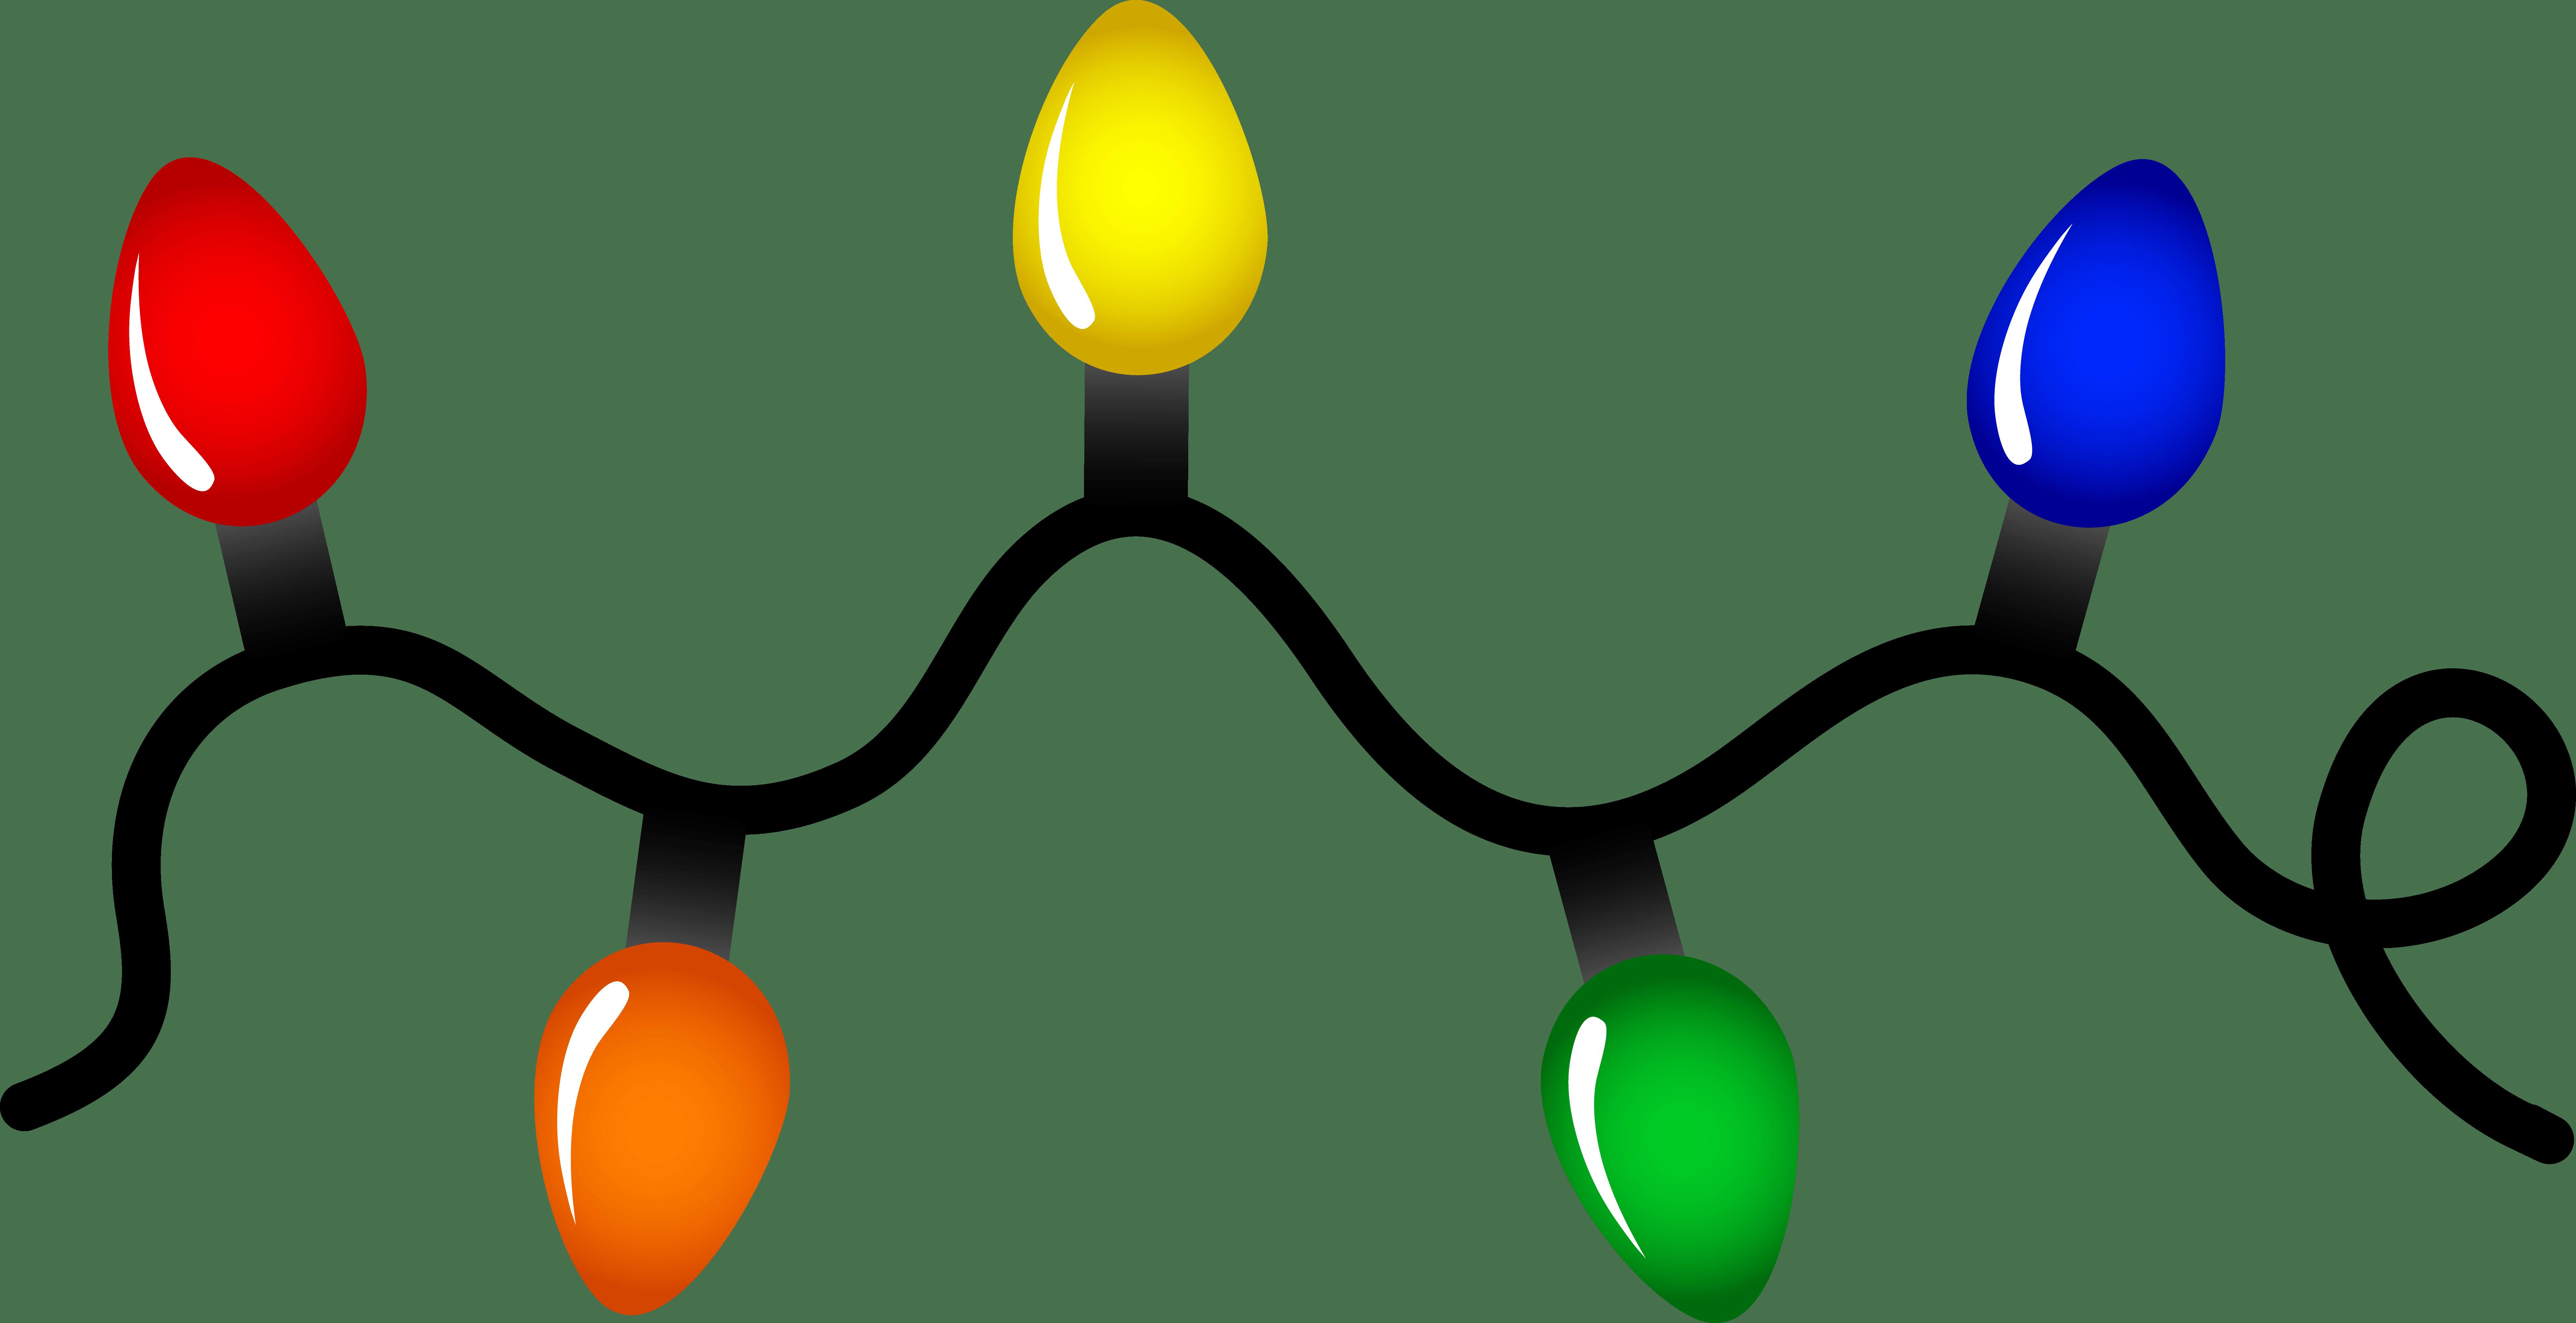 7709x3959 Christmas Light Bulb Clip Art Border